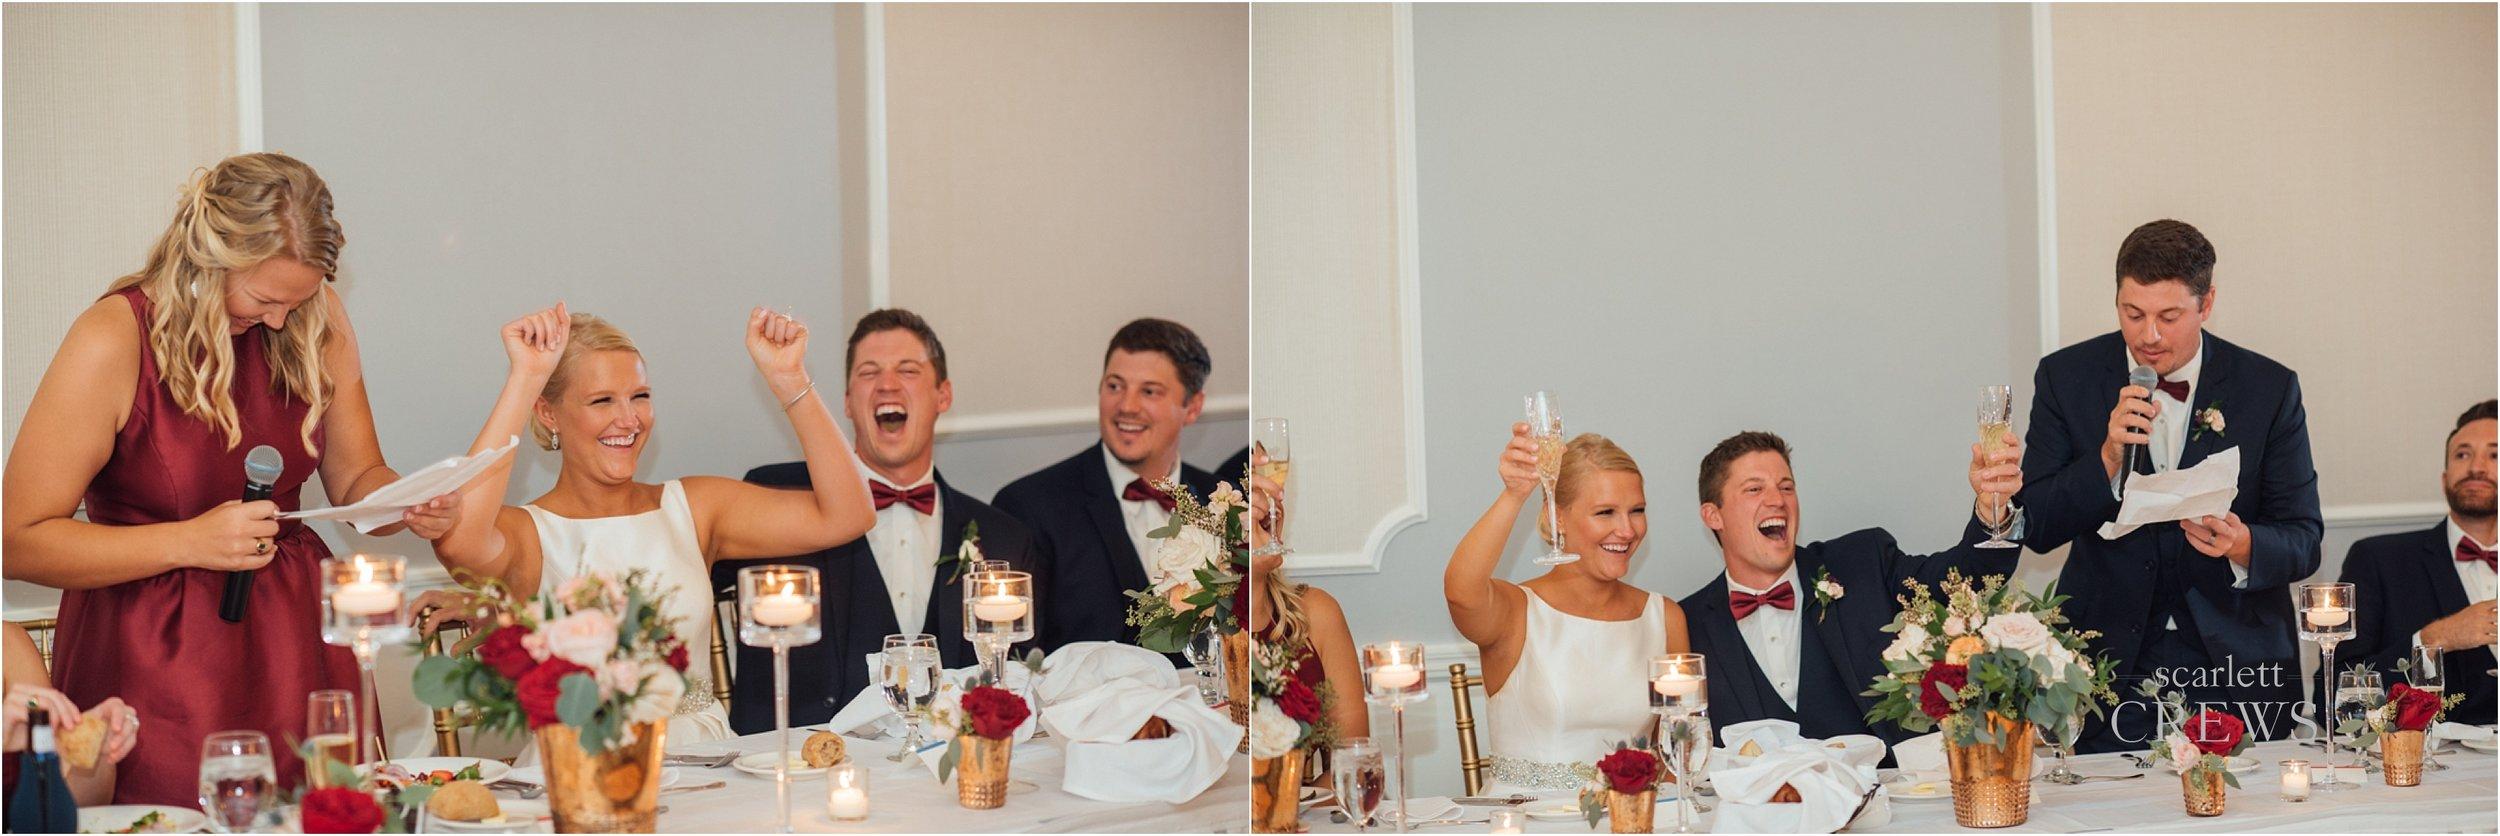 Sunset Country Club Wedding Juliette & Tim48.jpg